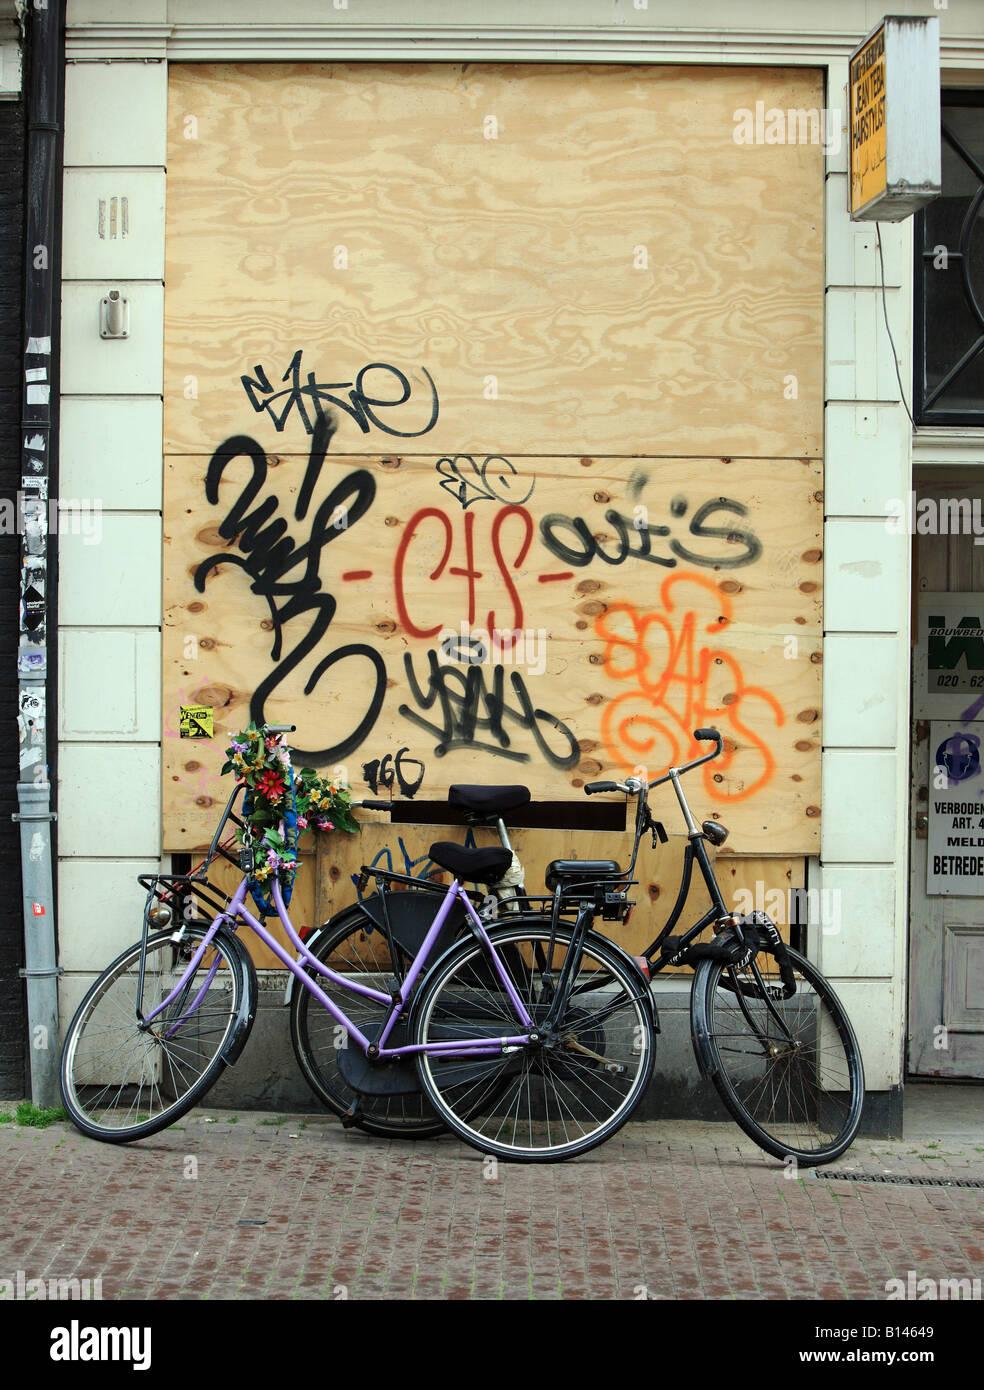 Amsterdam Bikes Two Stock Photos & Amsterdam Bikes Two Stock Images ...